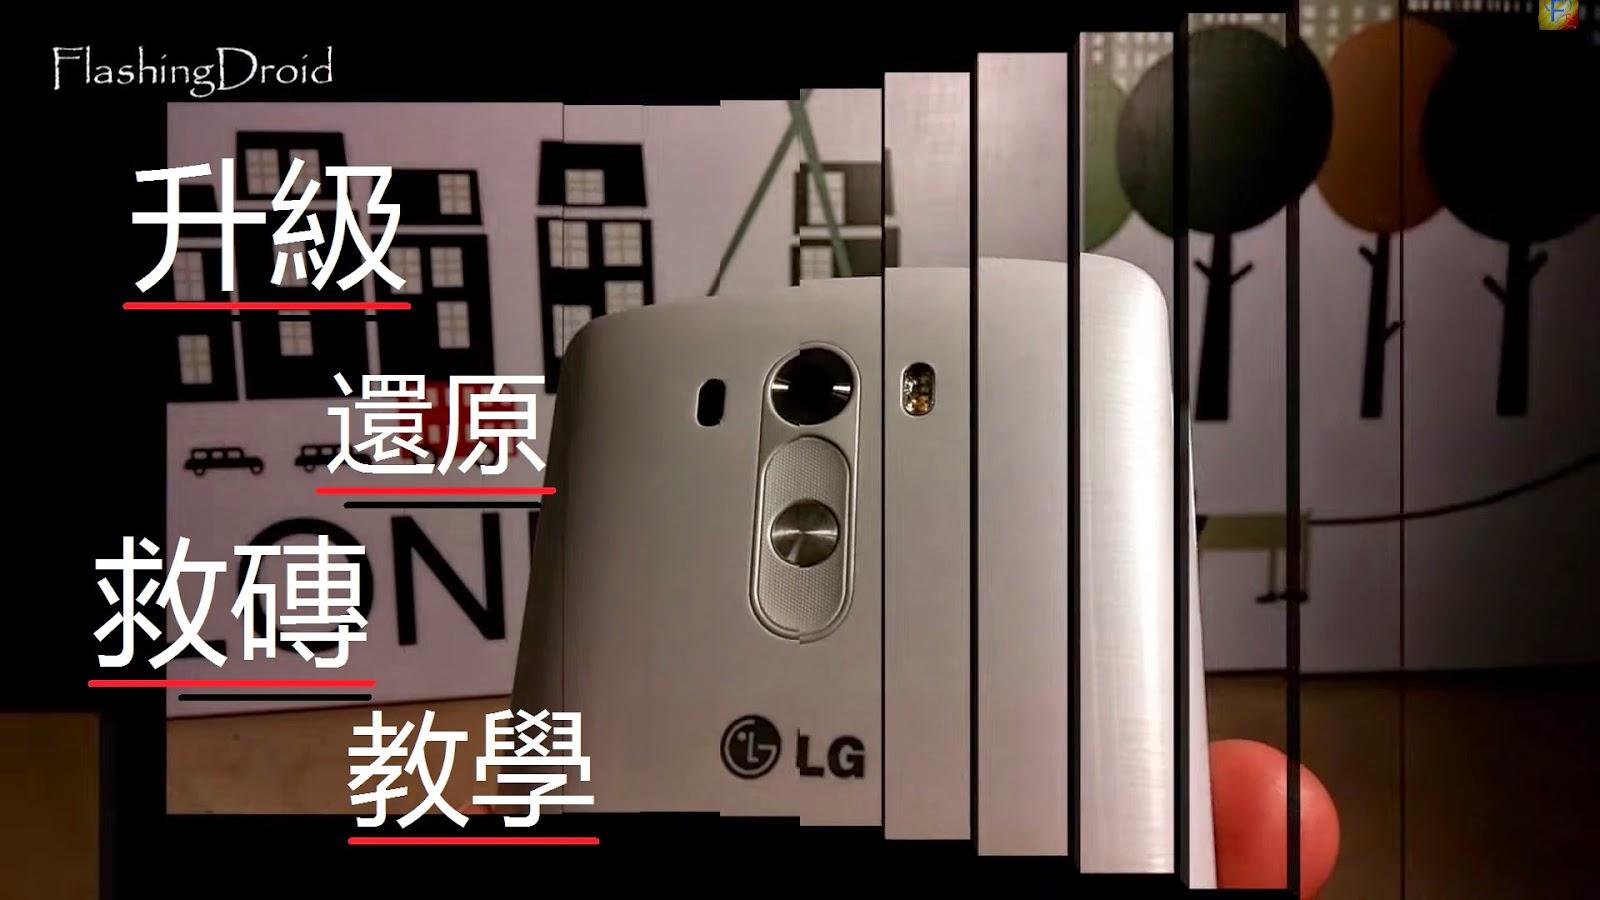 FlashingDroid: 【必看攻略】LG G3 刷 KDZ 升級 v10J | 救磚 | 還原 | ROOT 機三合一教學